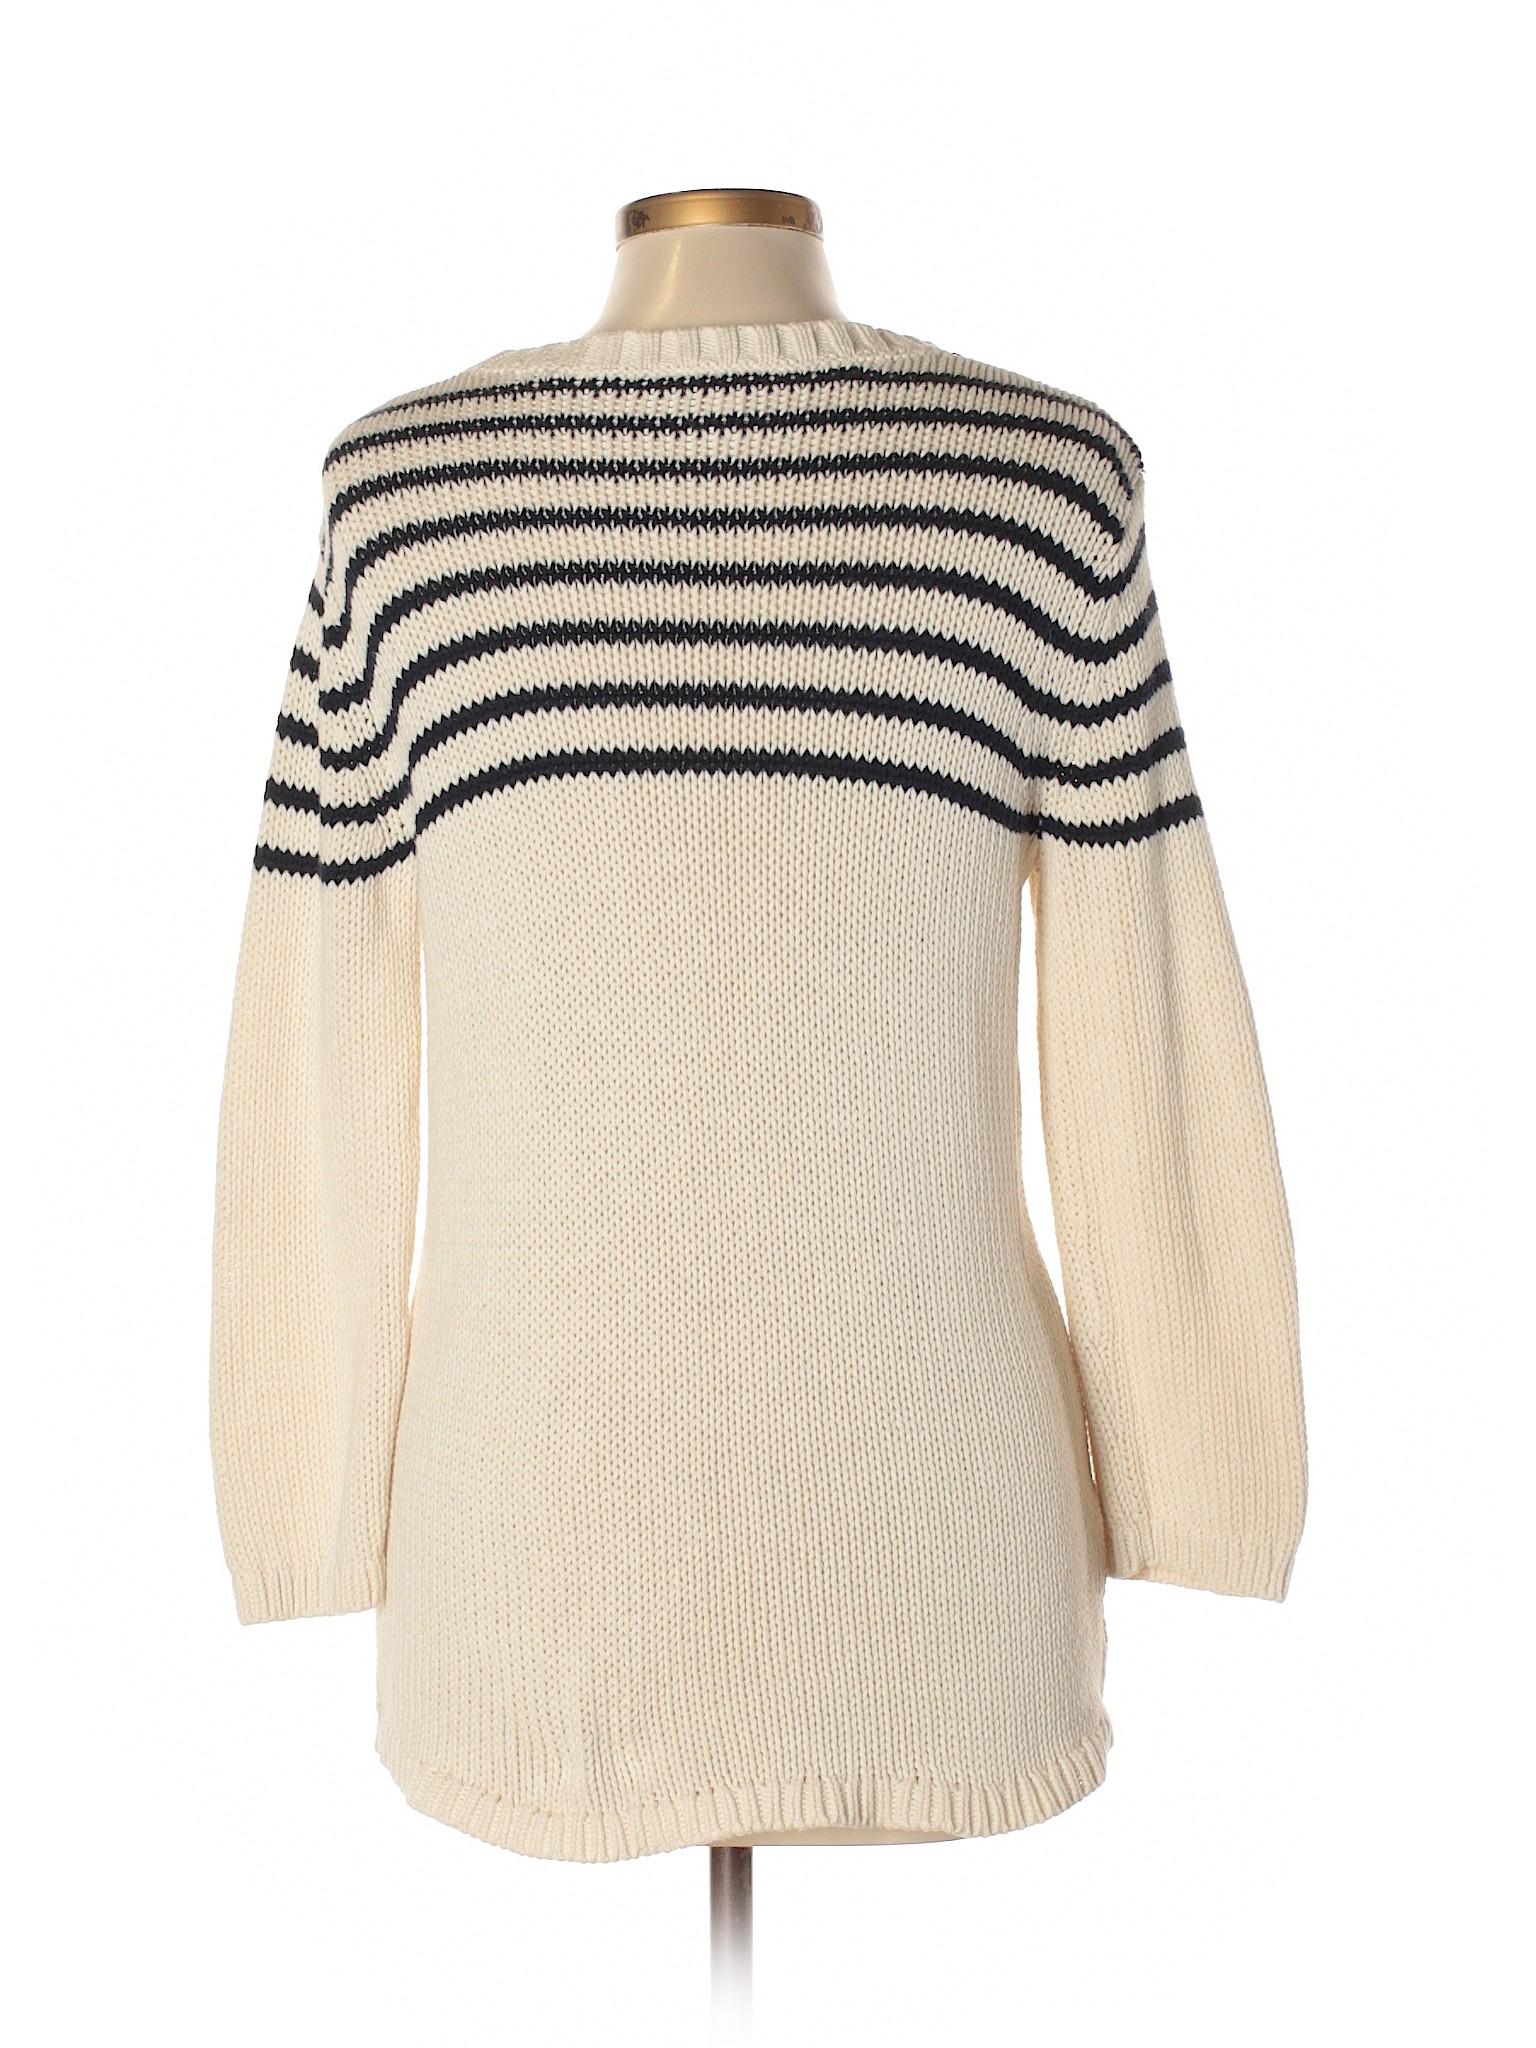 winter LOFT Taylor Pullover Ann Sweater Boutique p1Awxx